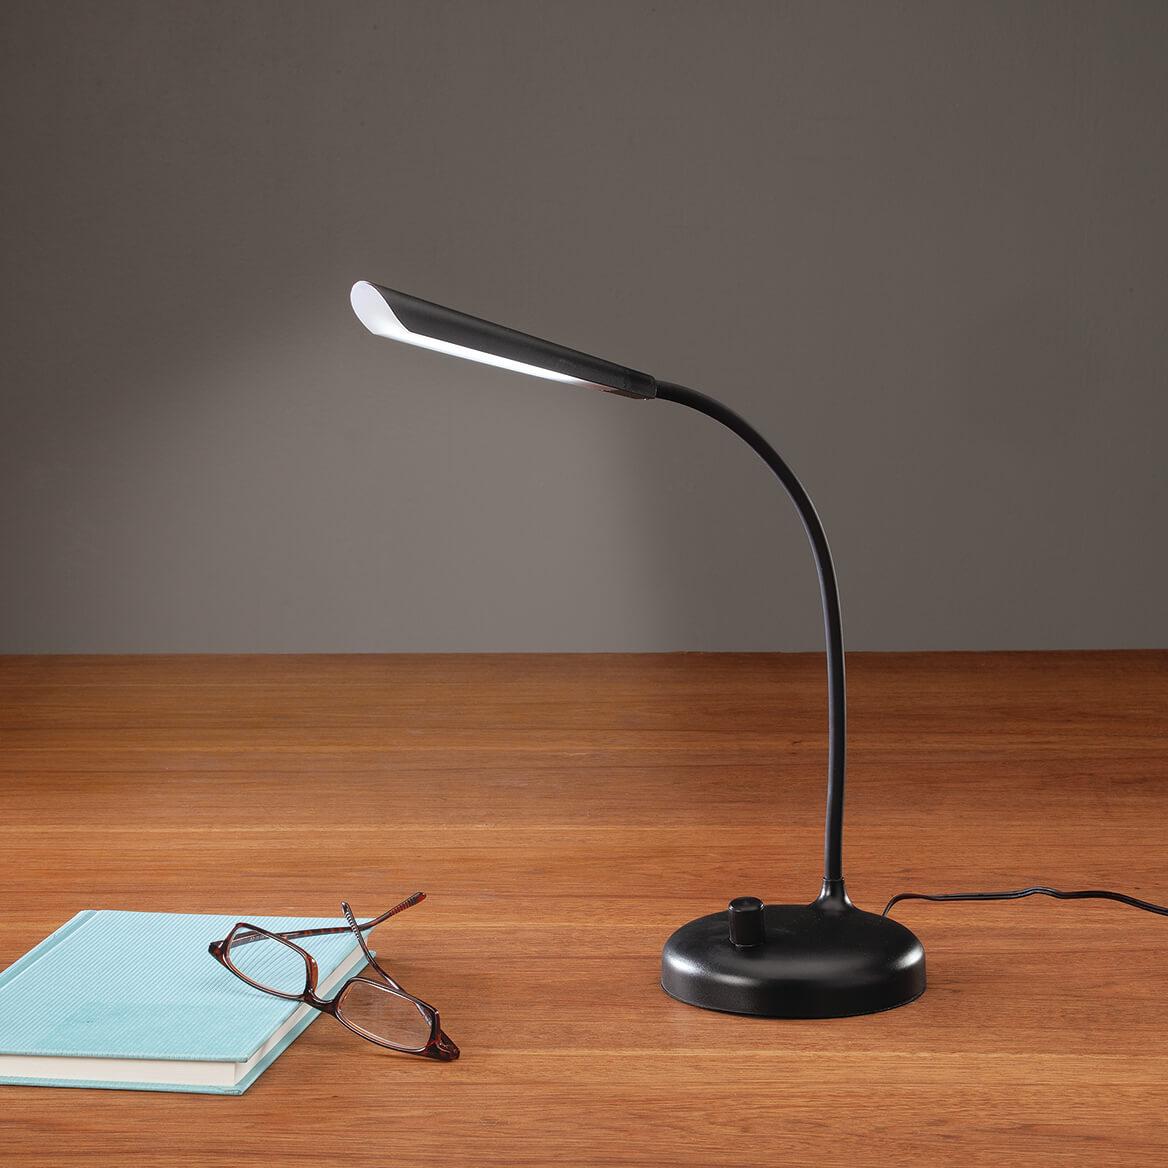 LED Gooseneck Desk Lamp With 3-Way Turn Switch-371667